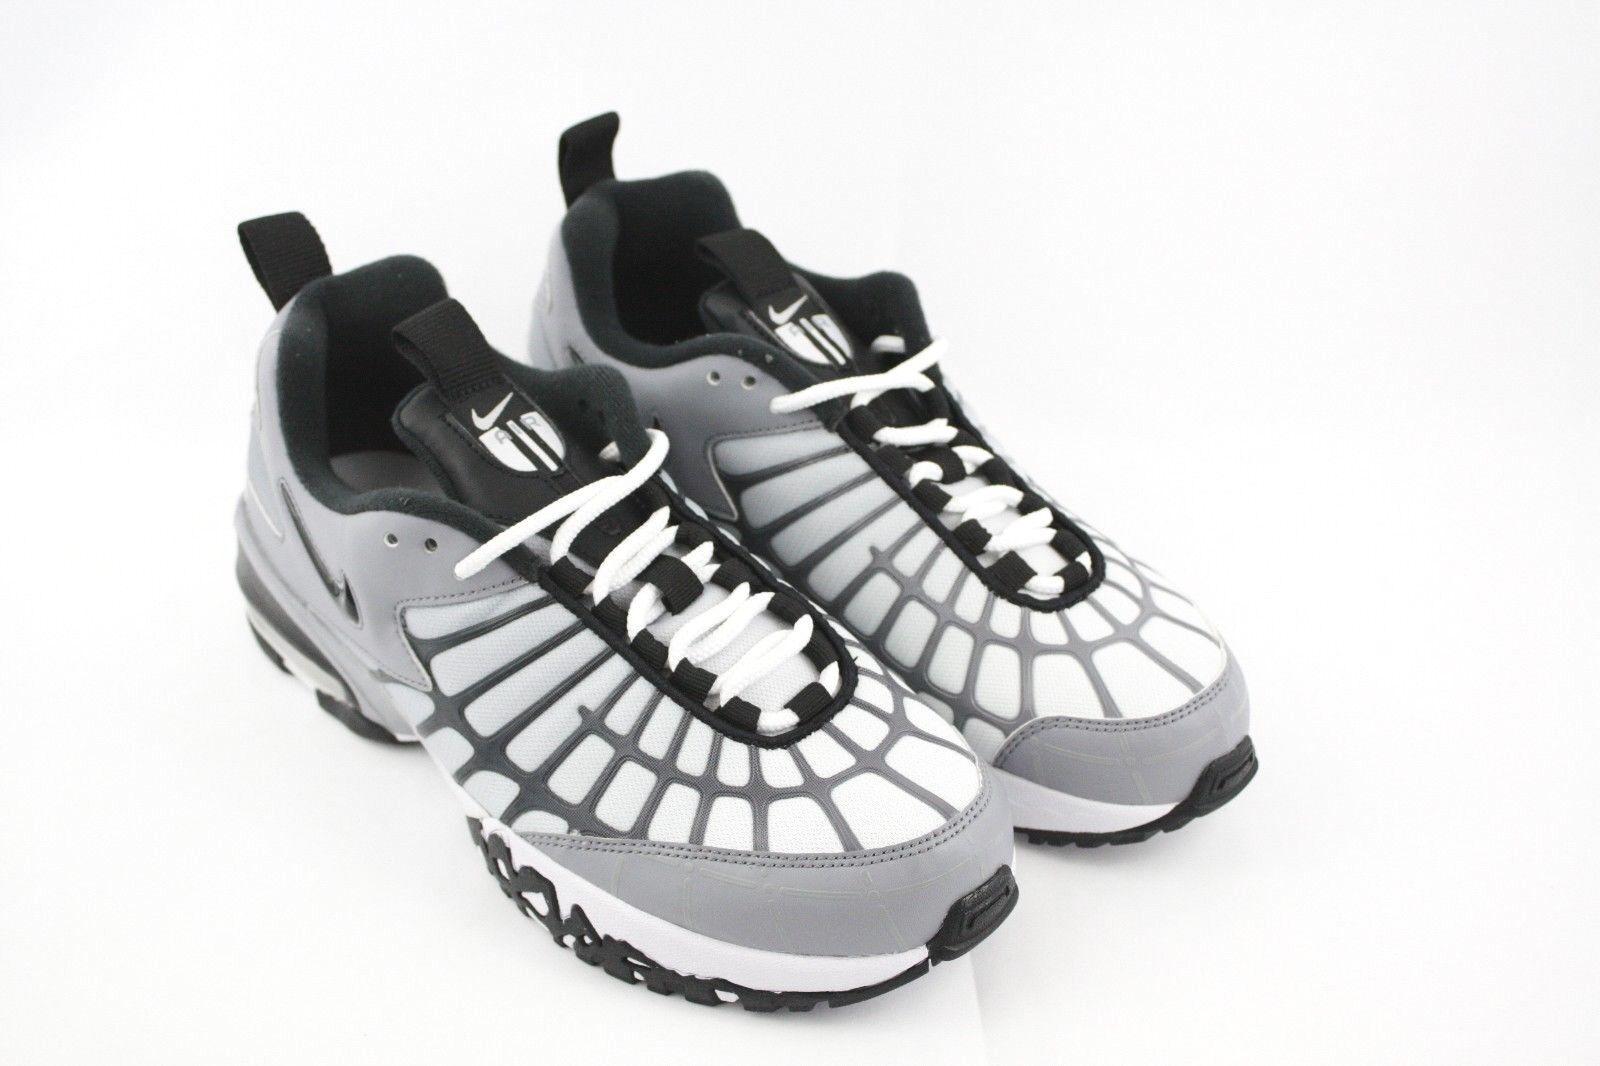 Nike Air Max 120 Size 8 Mens Fashion Sneakers Stealth/Black/White  819857-002